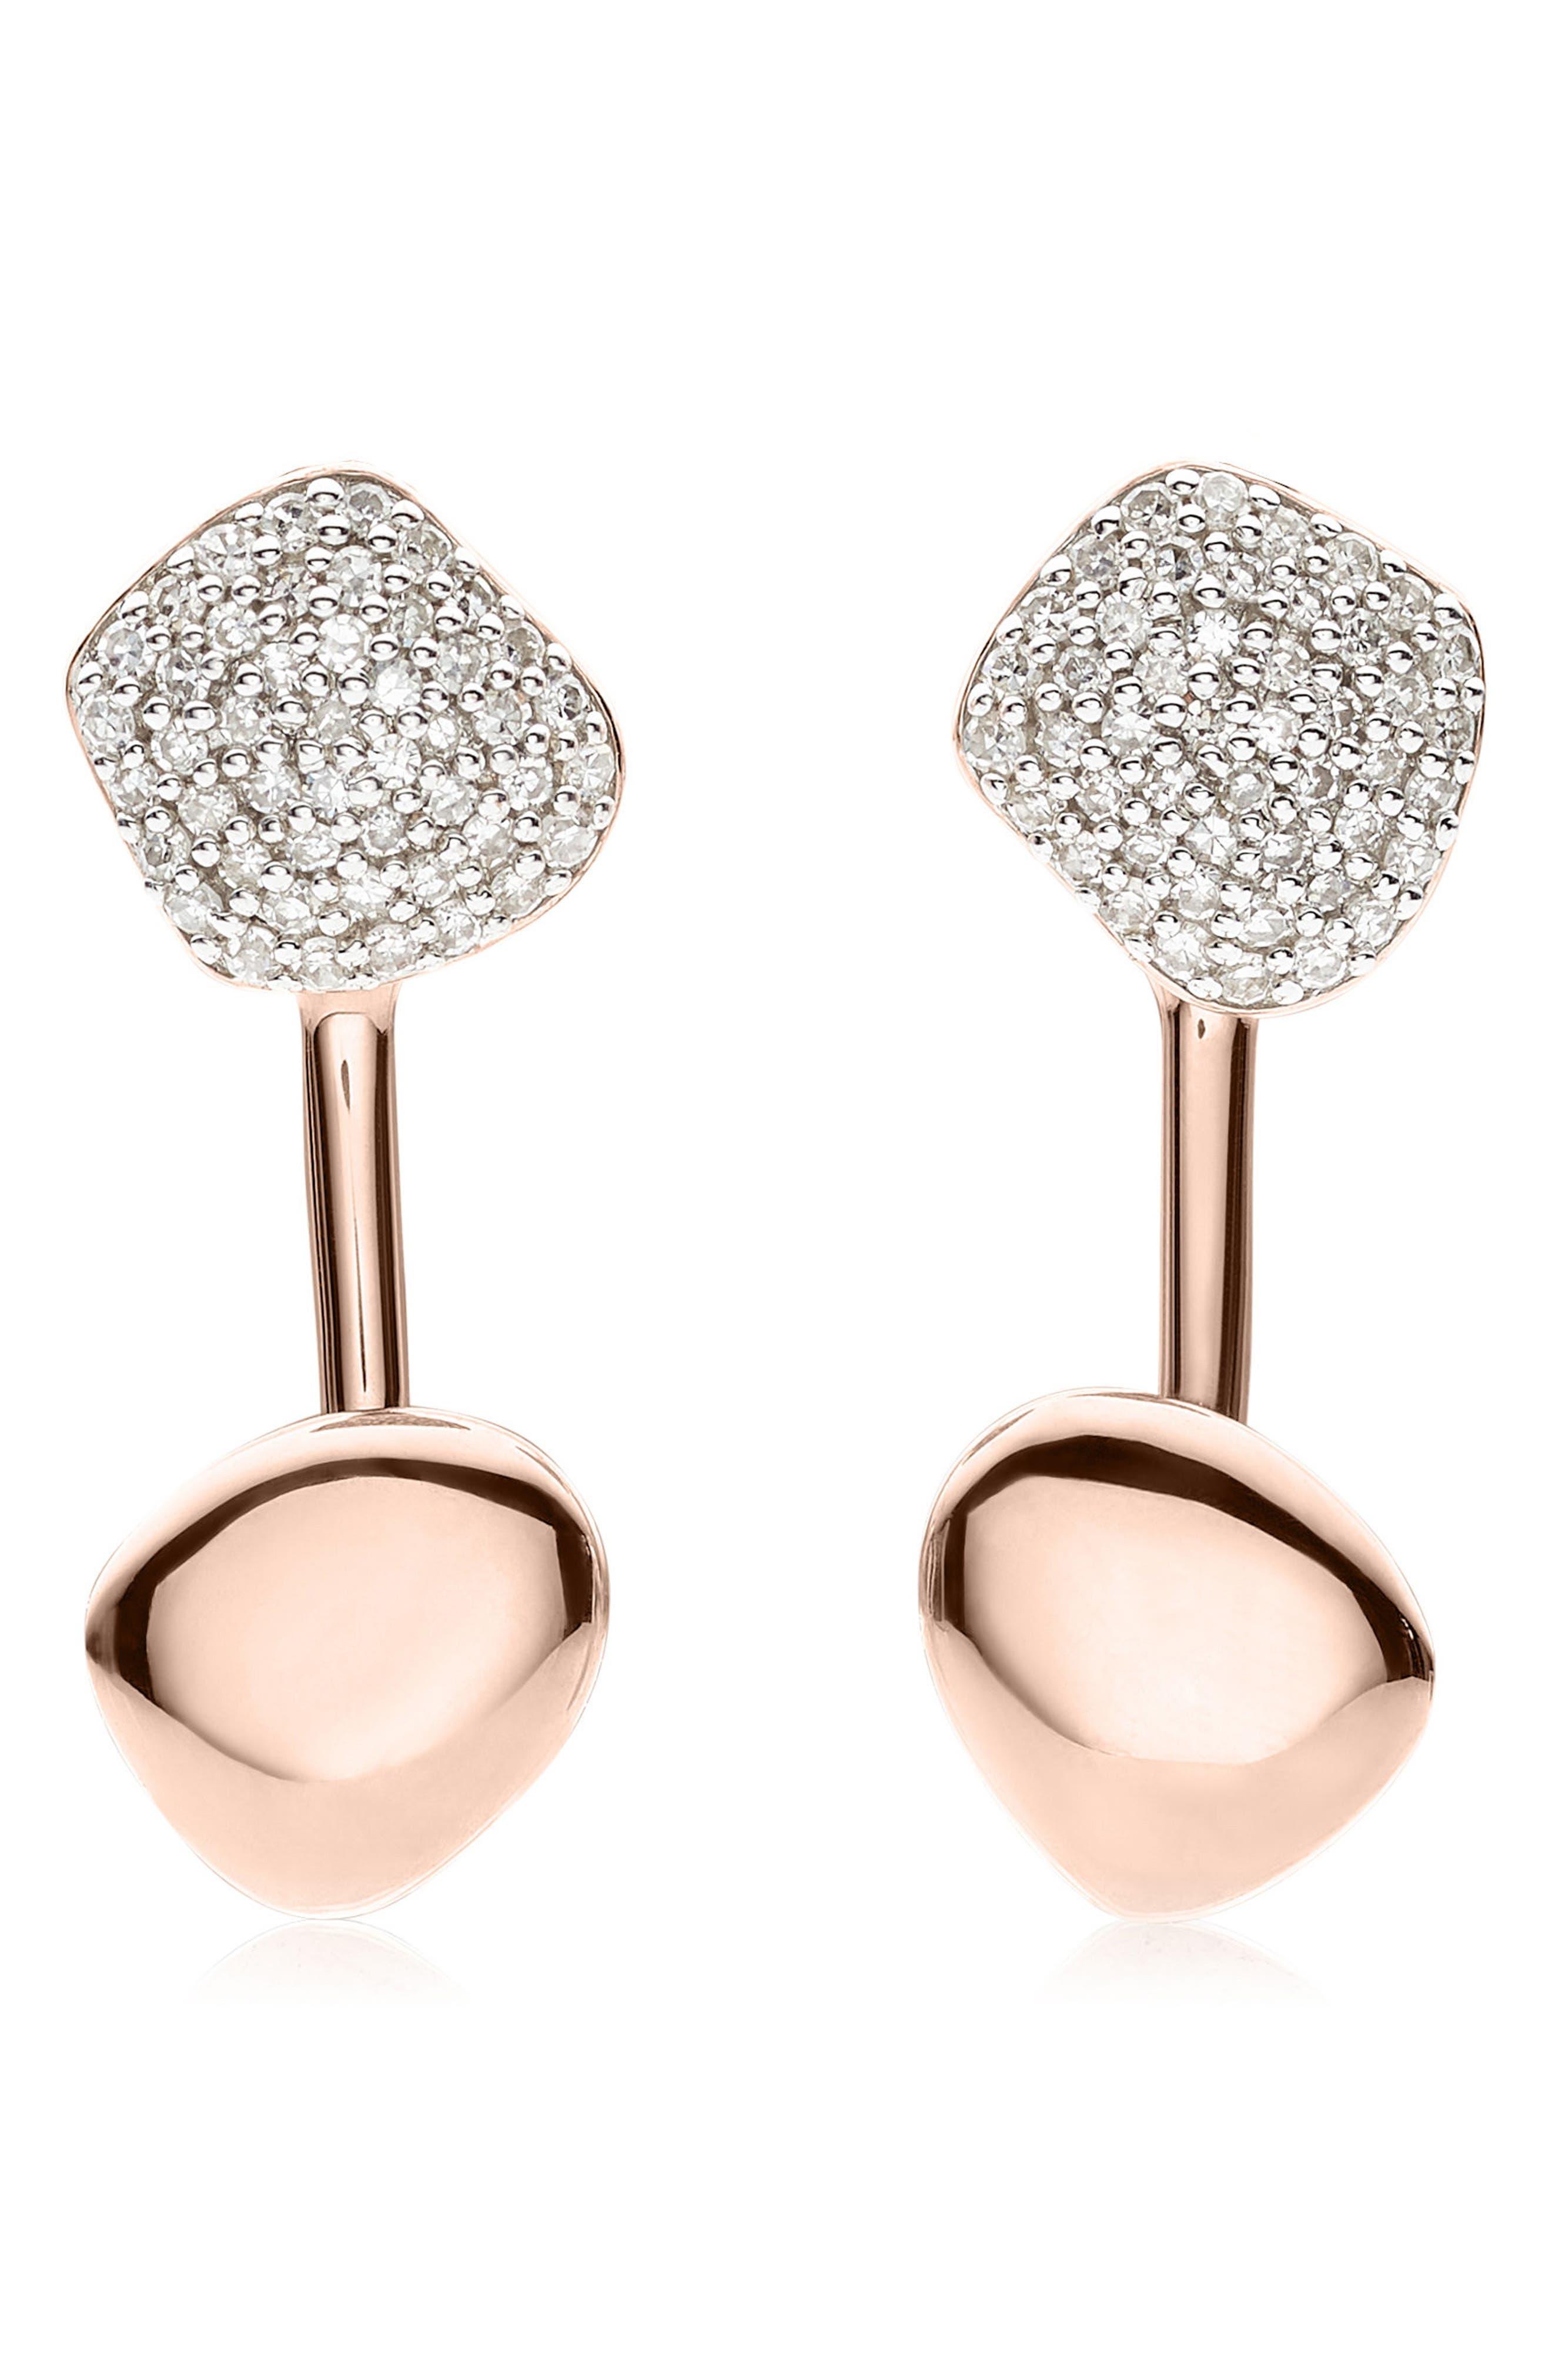 Nura Nugget Diamond Jacket Earrings,                         Main,                         color, Rose Gold